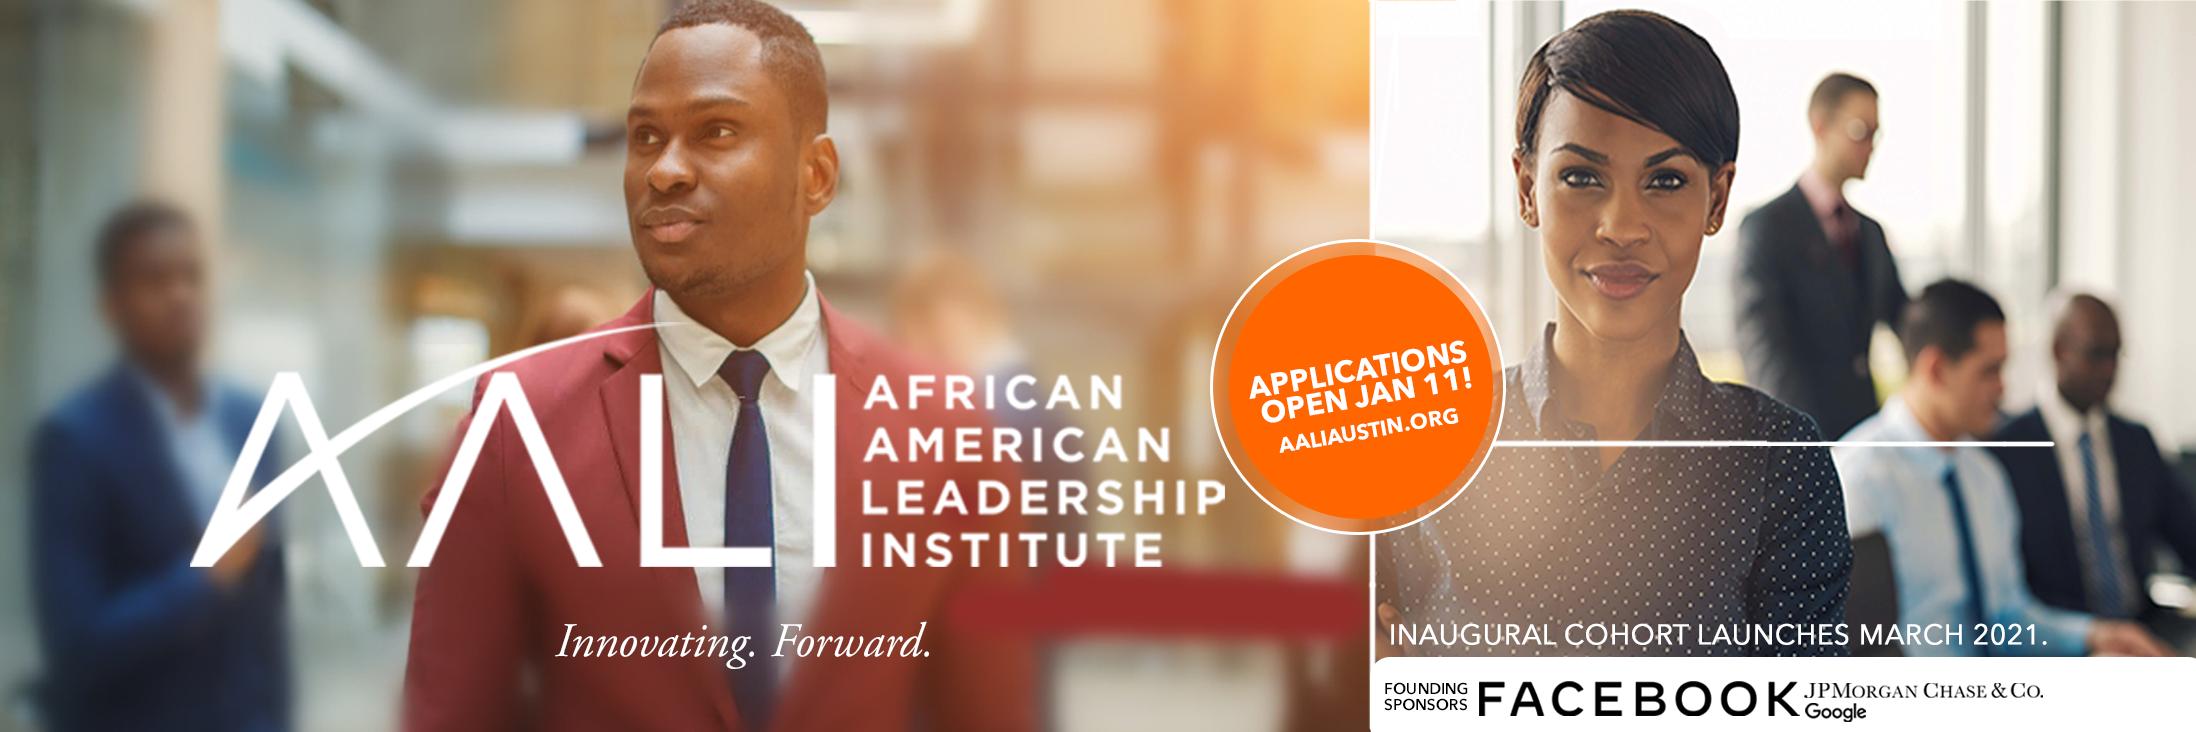 The African American Leadership Institute - AALI in Austin, Tx